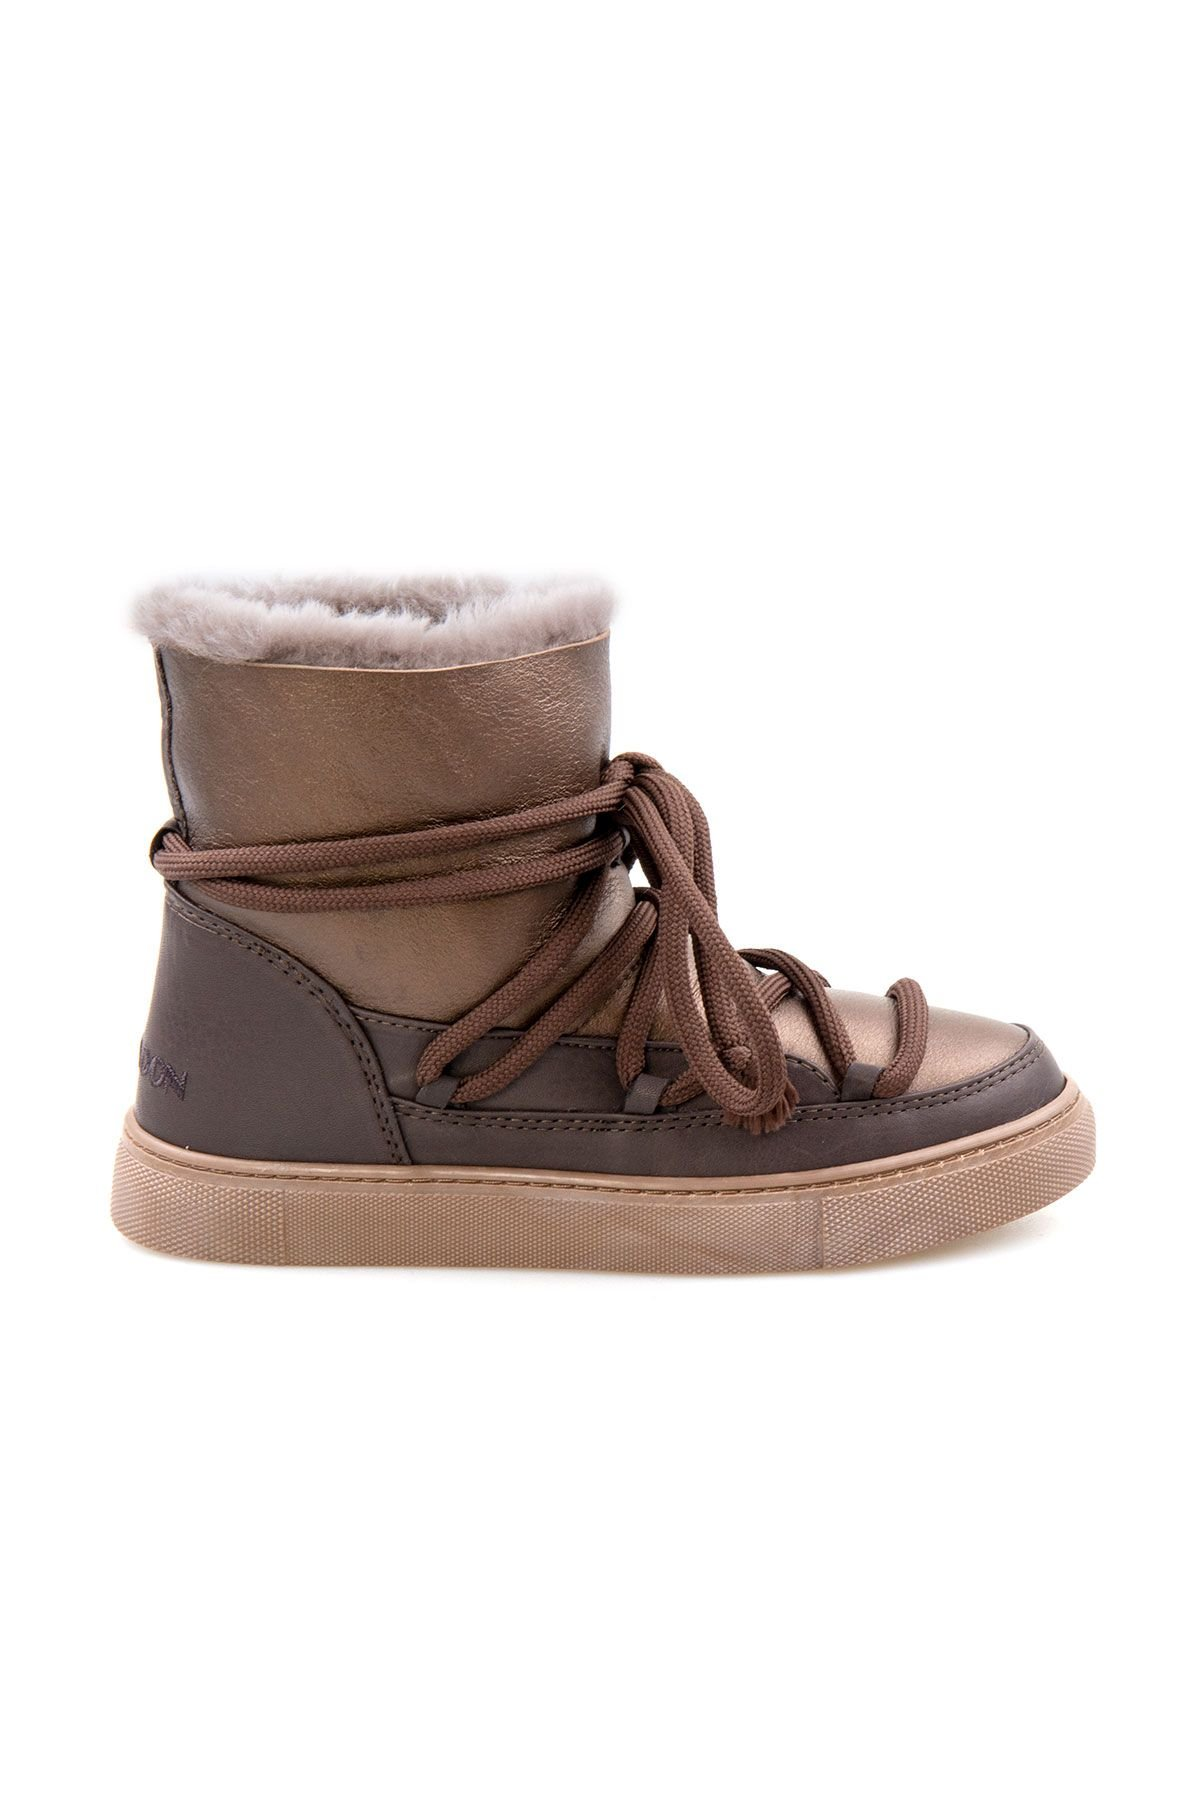 Cool Moon Genuine Sheepskin Women Sneakers 355108 Brown